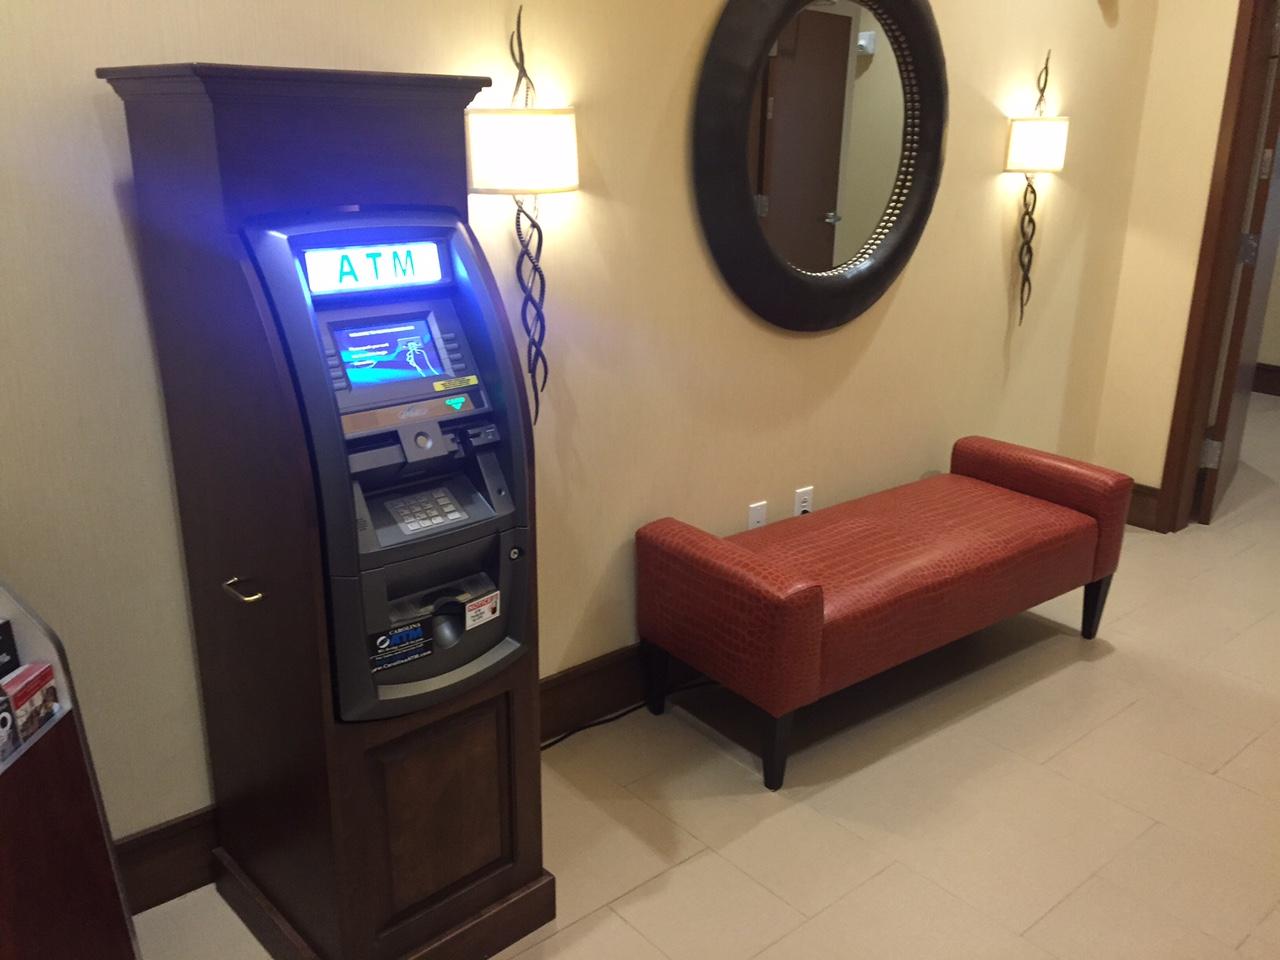 Carolina ATM - ATM Services & Solutions | Gallery - Mobile ATMS & Festivals 61